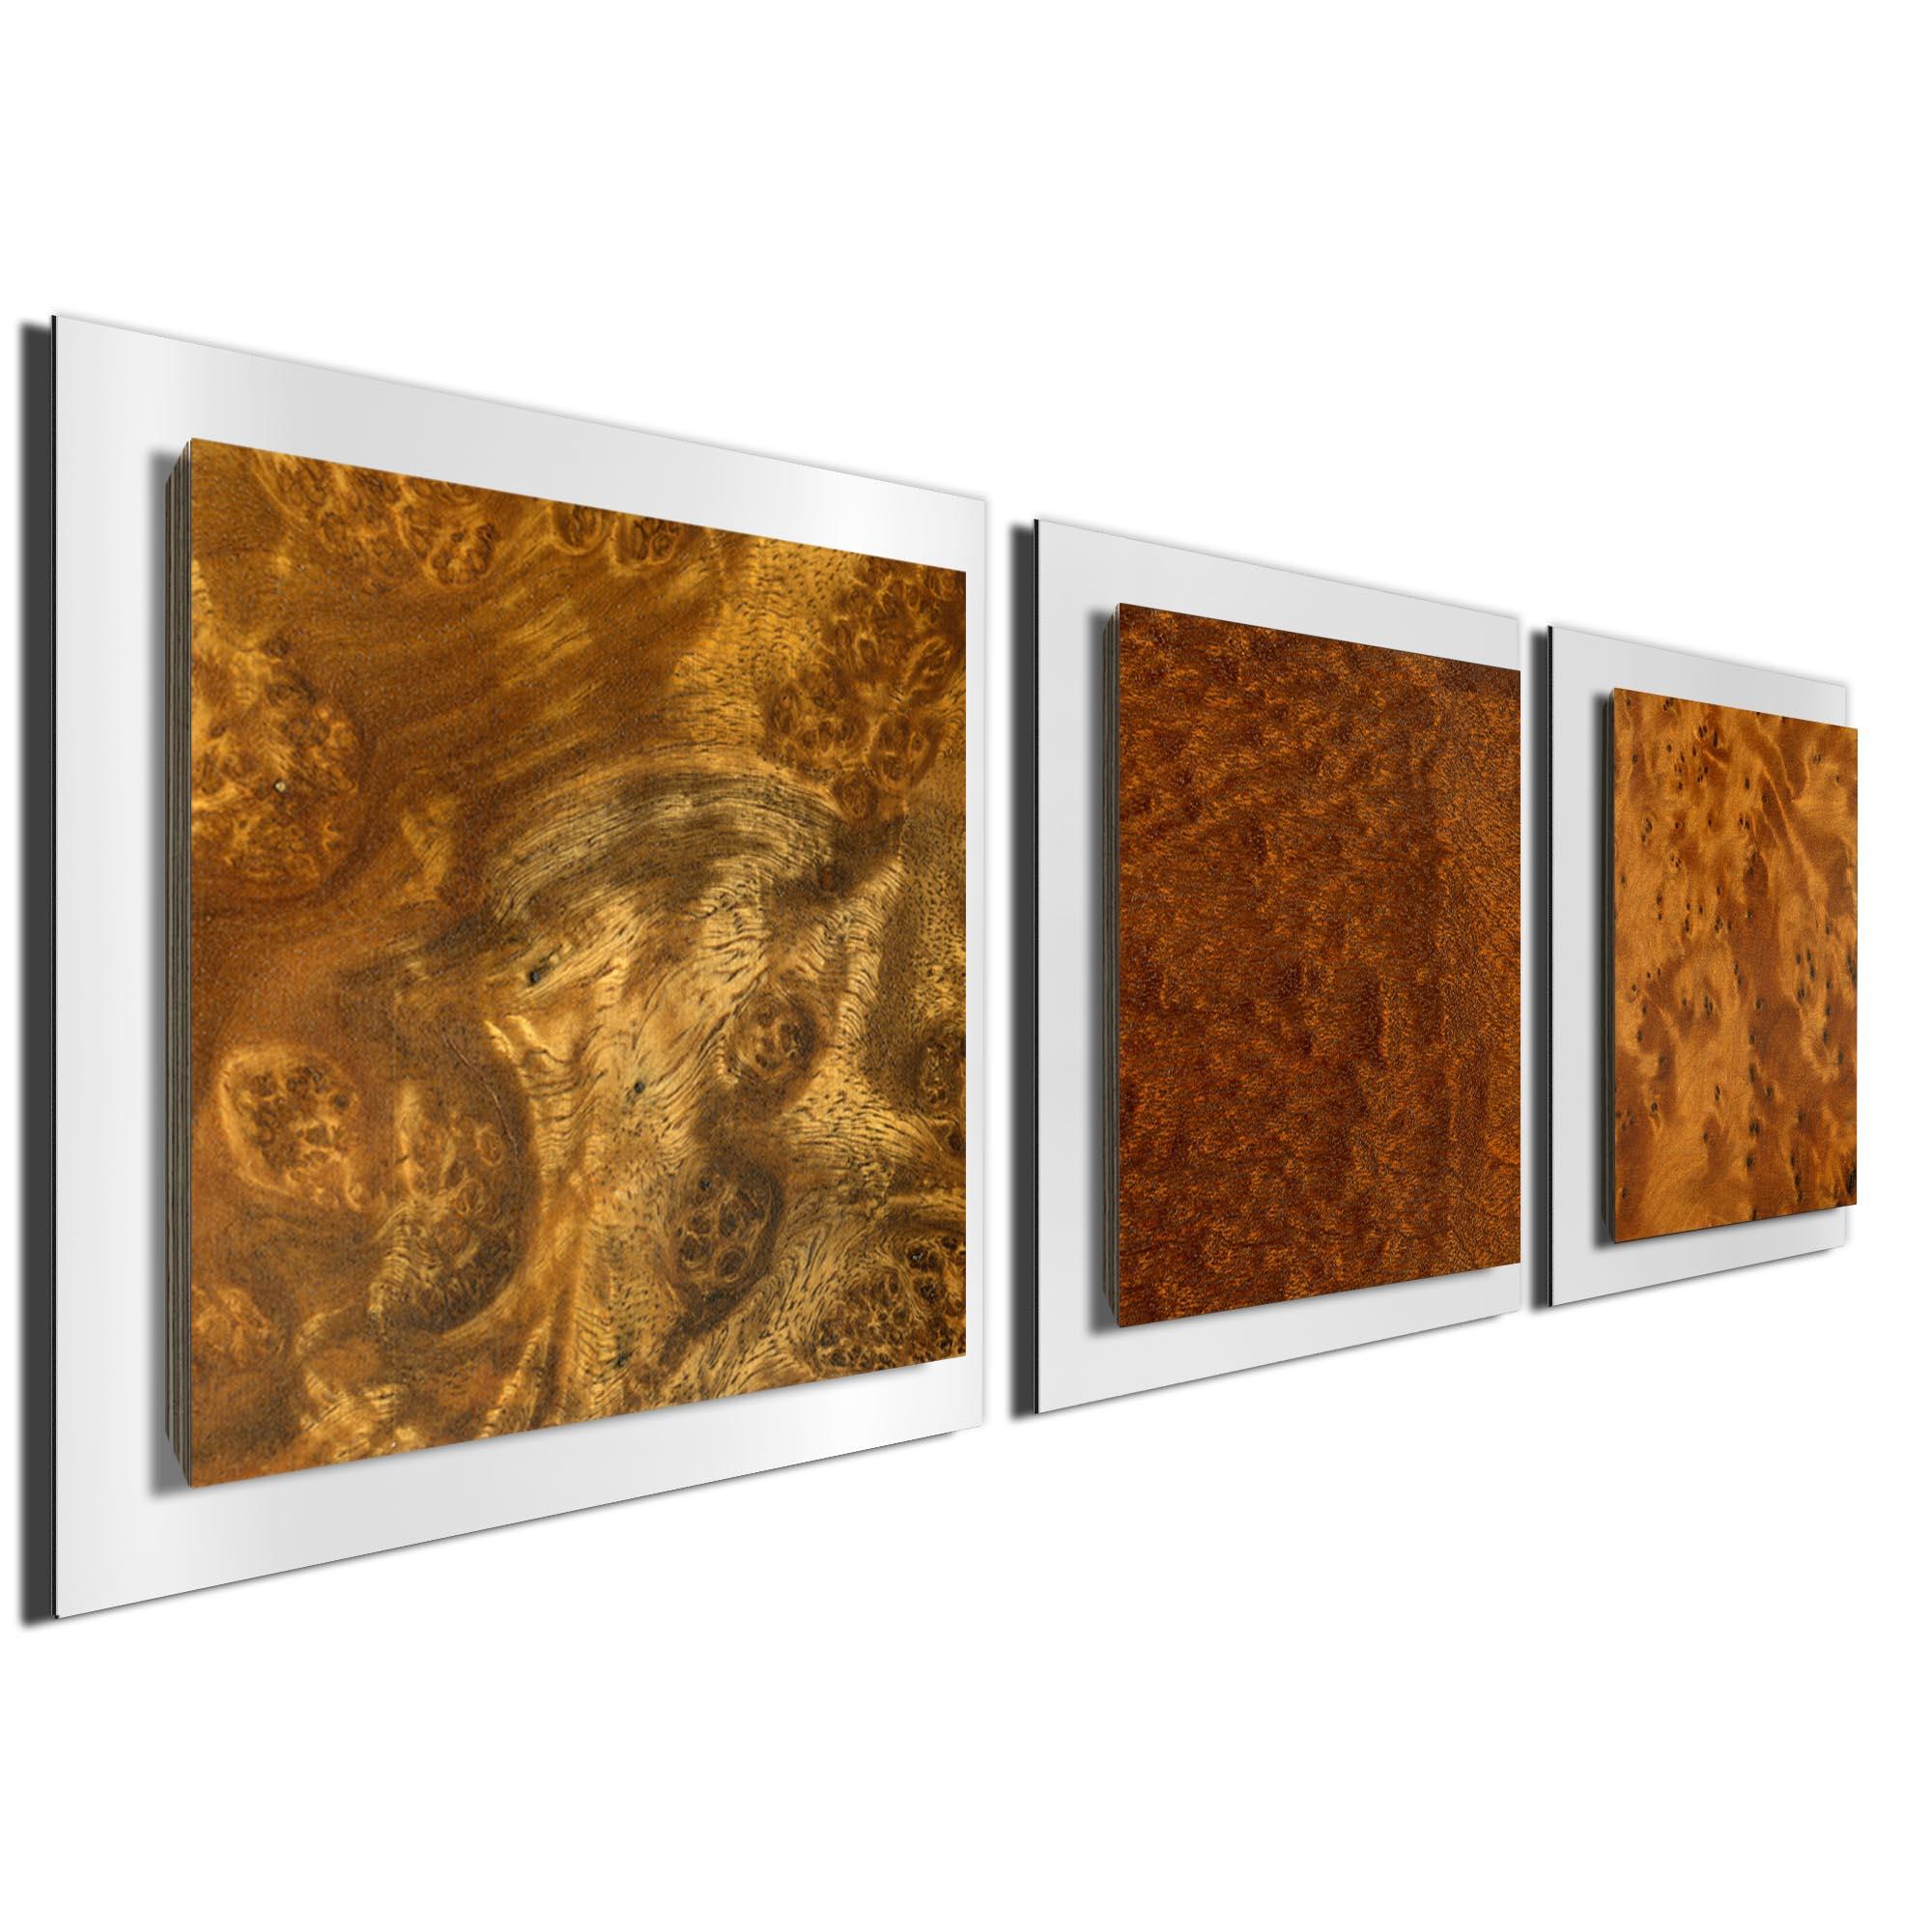 Dark Burl Essence White by Jackson Wright Rustic Modern Style Wood Wall Art - Image 2